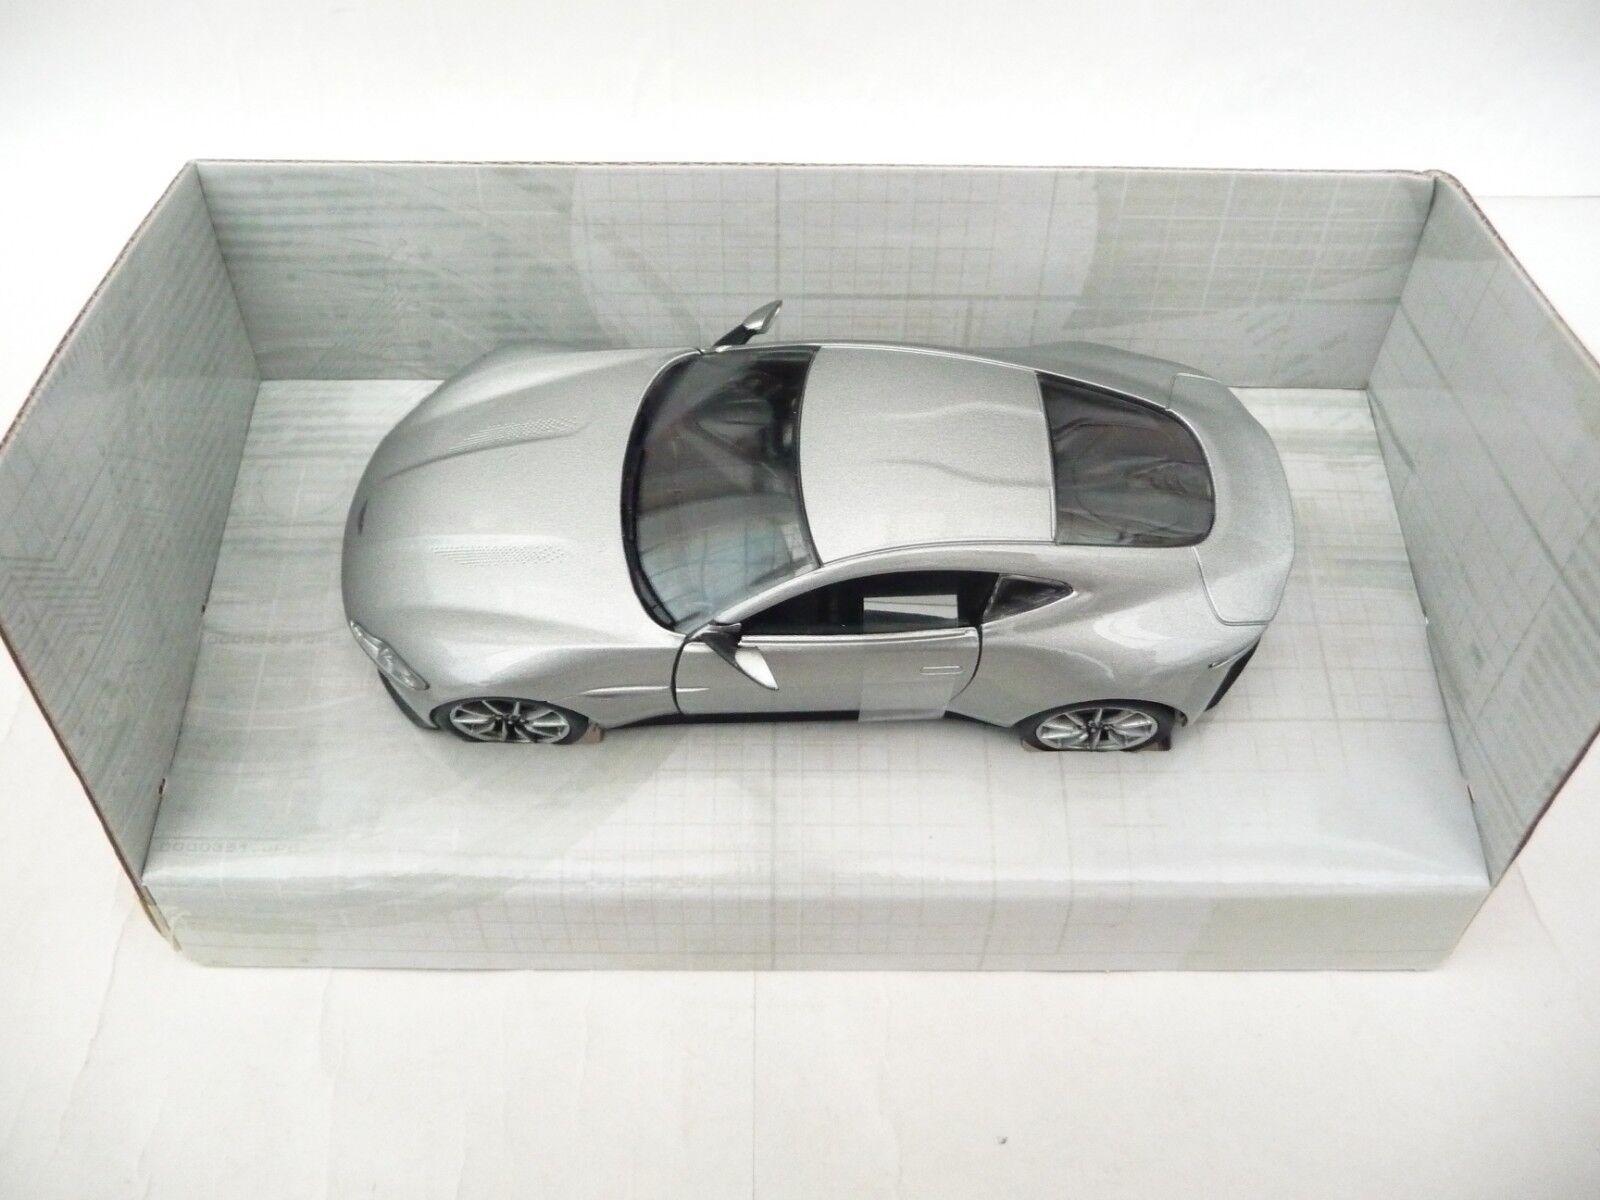 CORGI 1 36 Aston Martin DB10 Argent Spectre JAMES BOND 007 CC08001